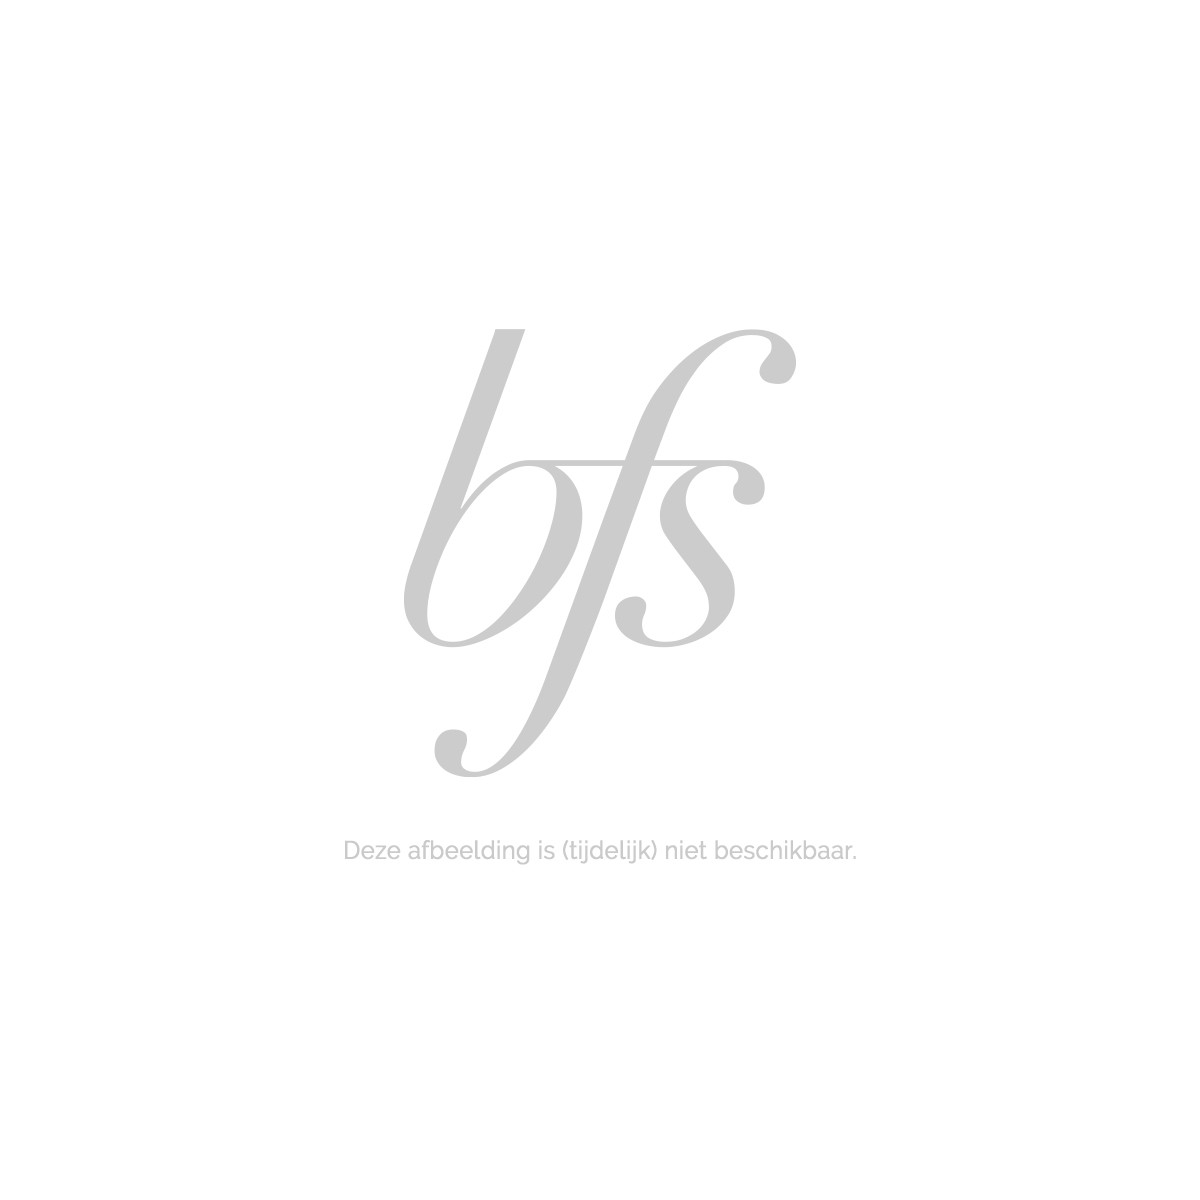 Diva Professional Styling Keramische Warmteborstel 30Mm